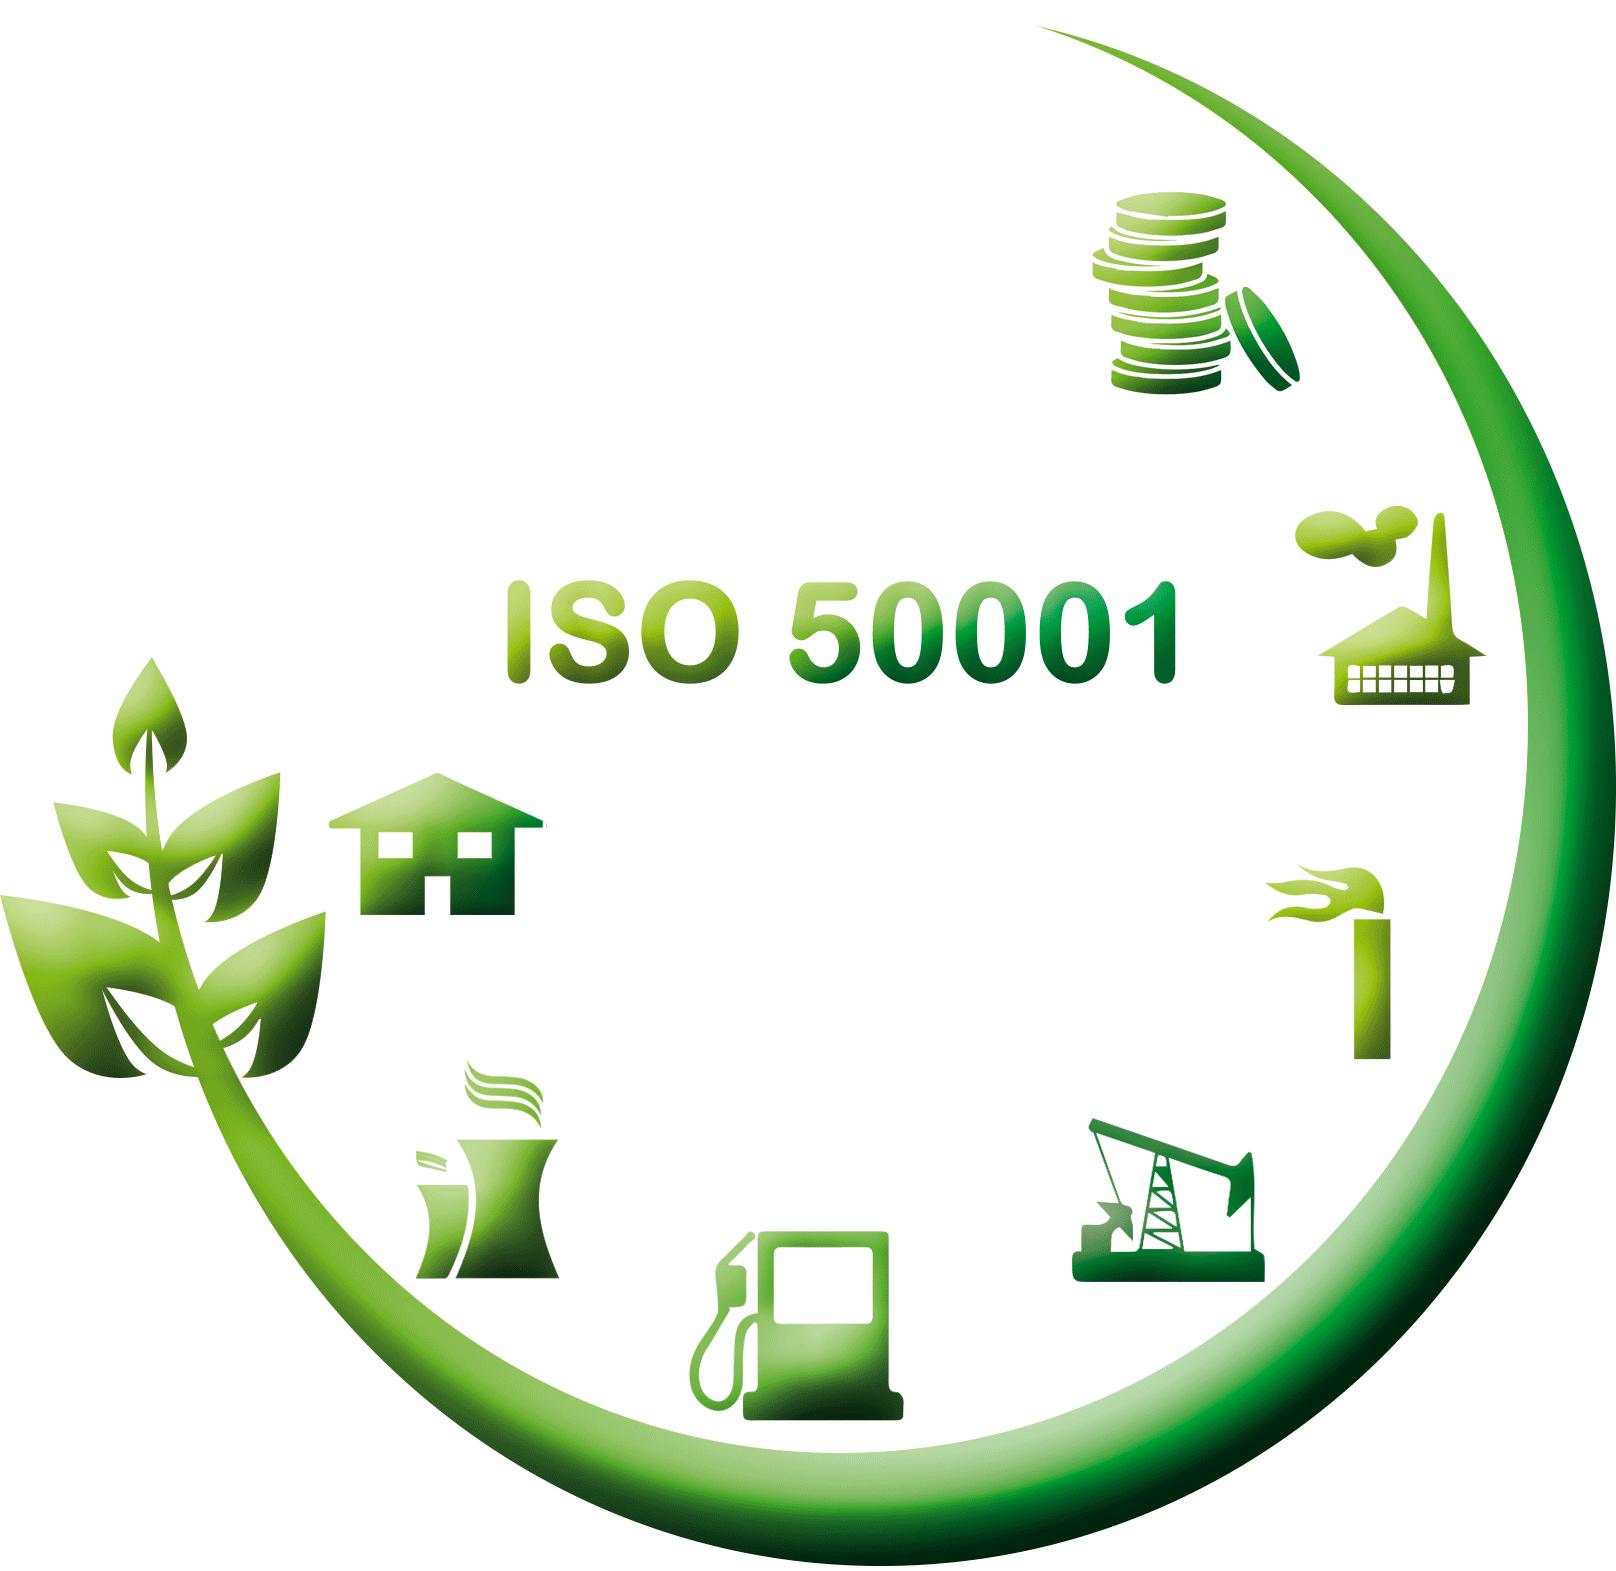 Iso-iso-50001